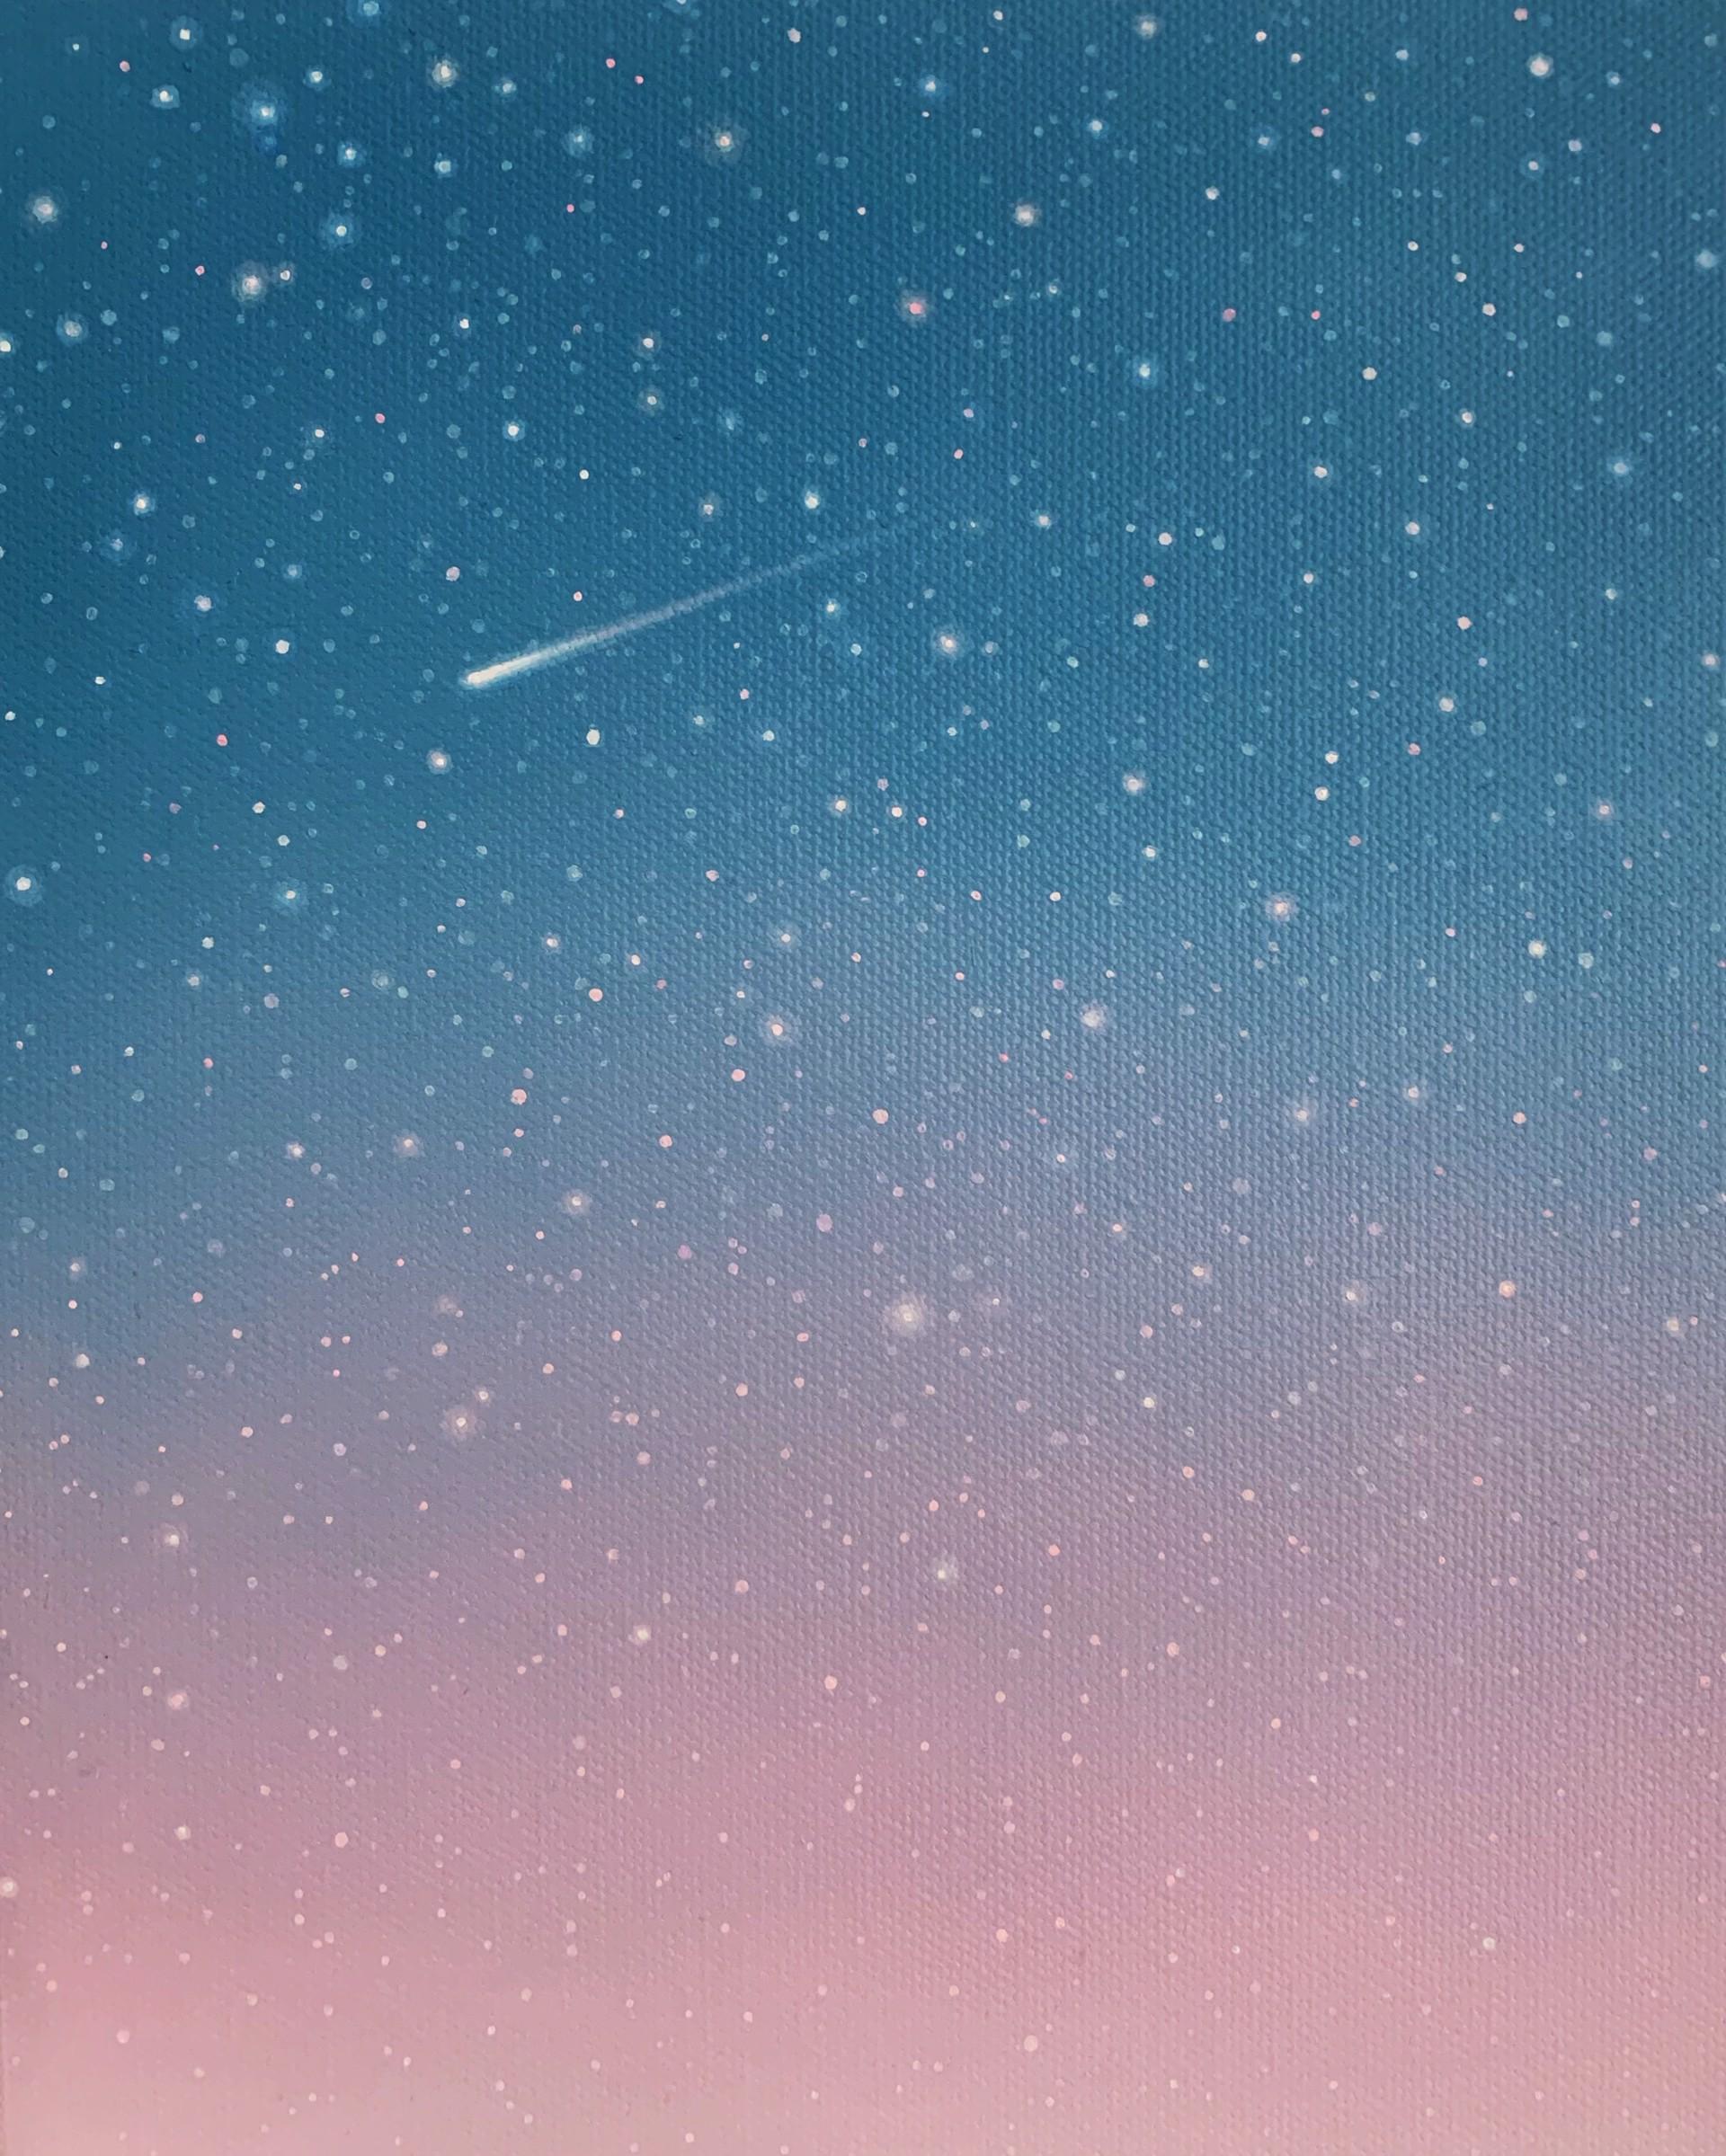 Shooting Star by Rachel Walter